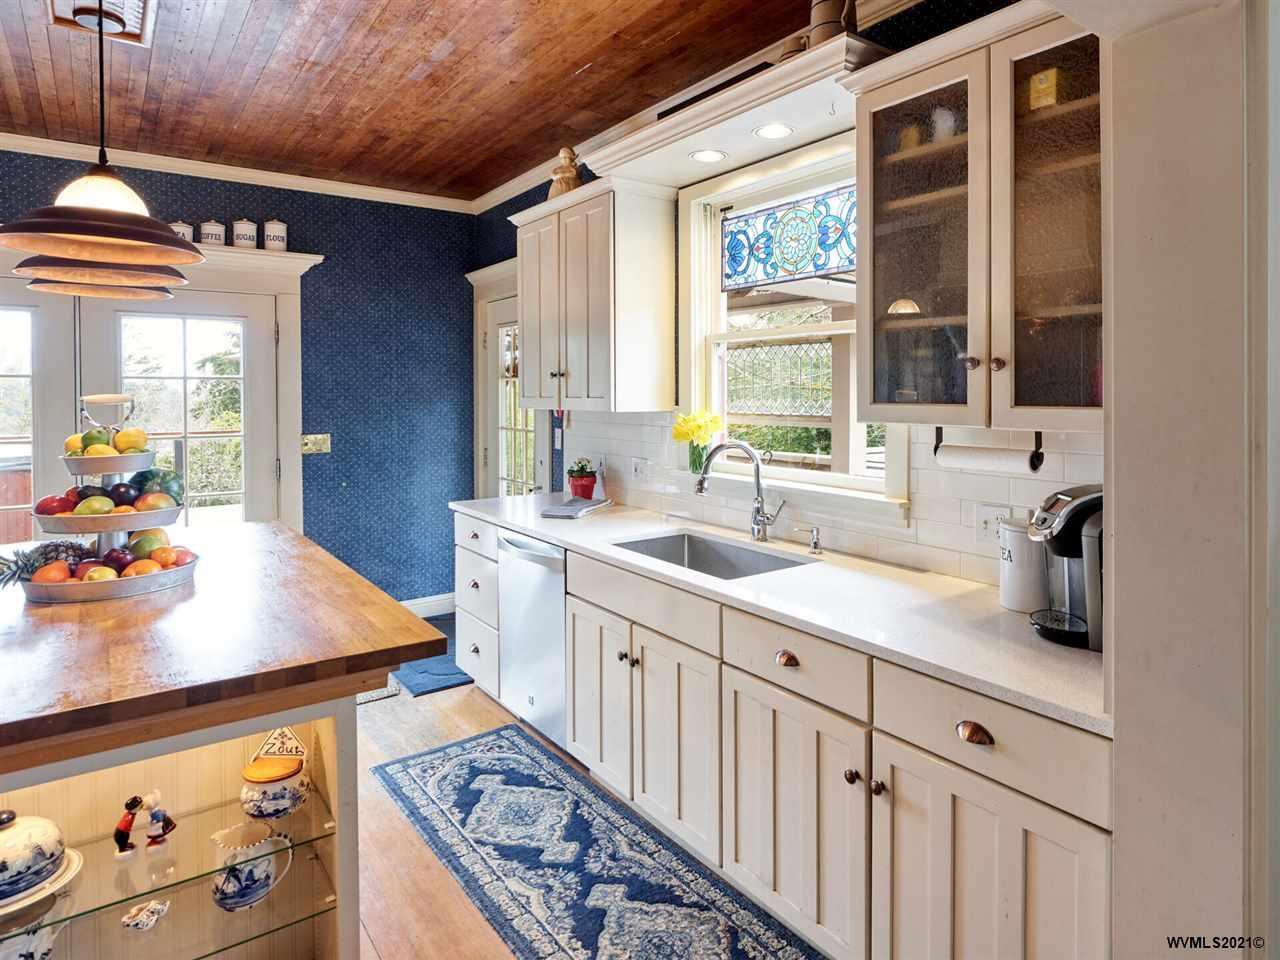 204 Rock St, Silverton, Oregon 97381, 4 Bedrooms Bedrooms, ,2 BathroomsBathrooms,Single Family,For Sale,204 Rock St,2,775912